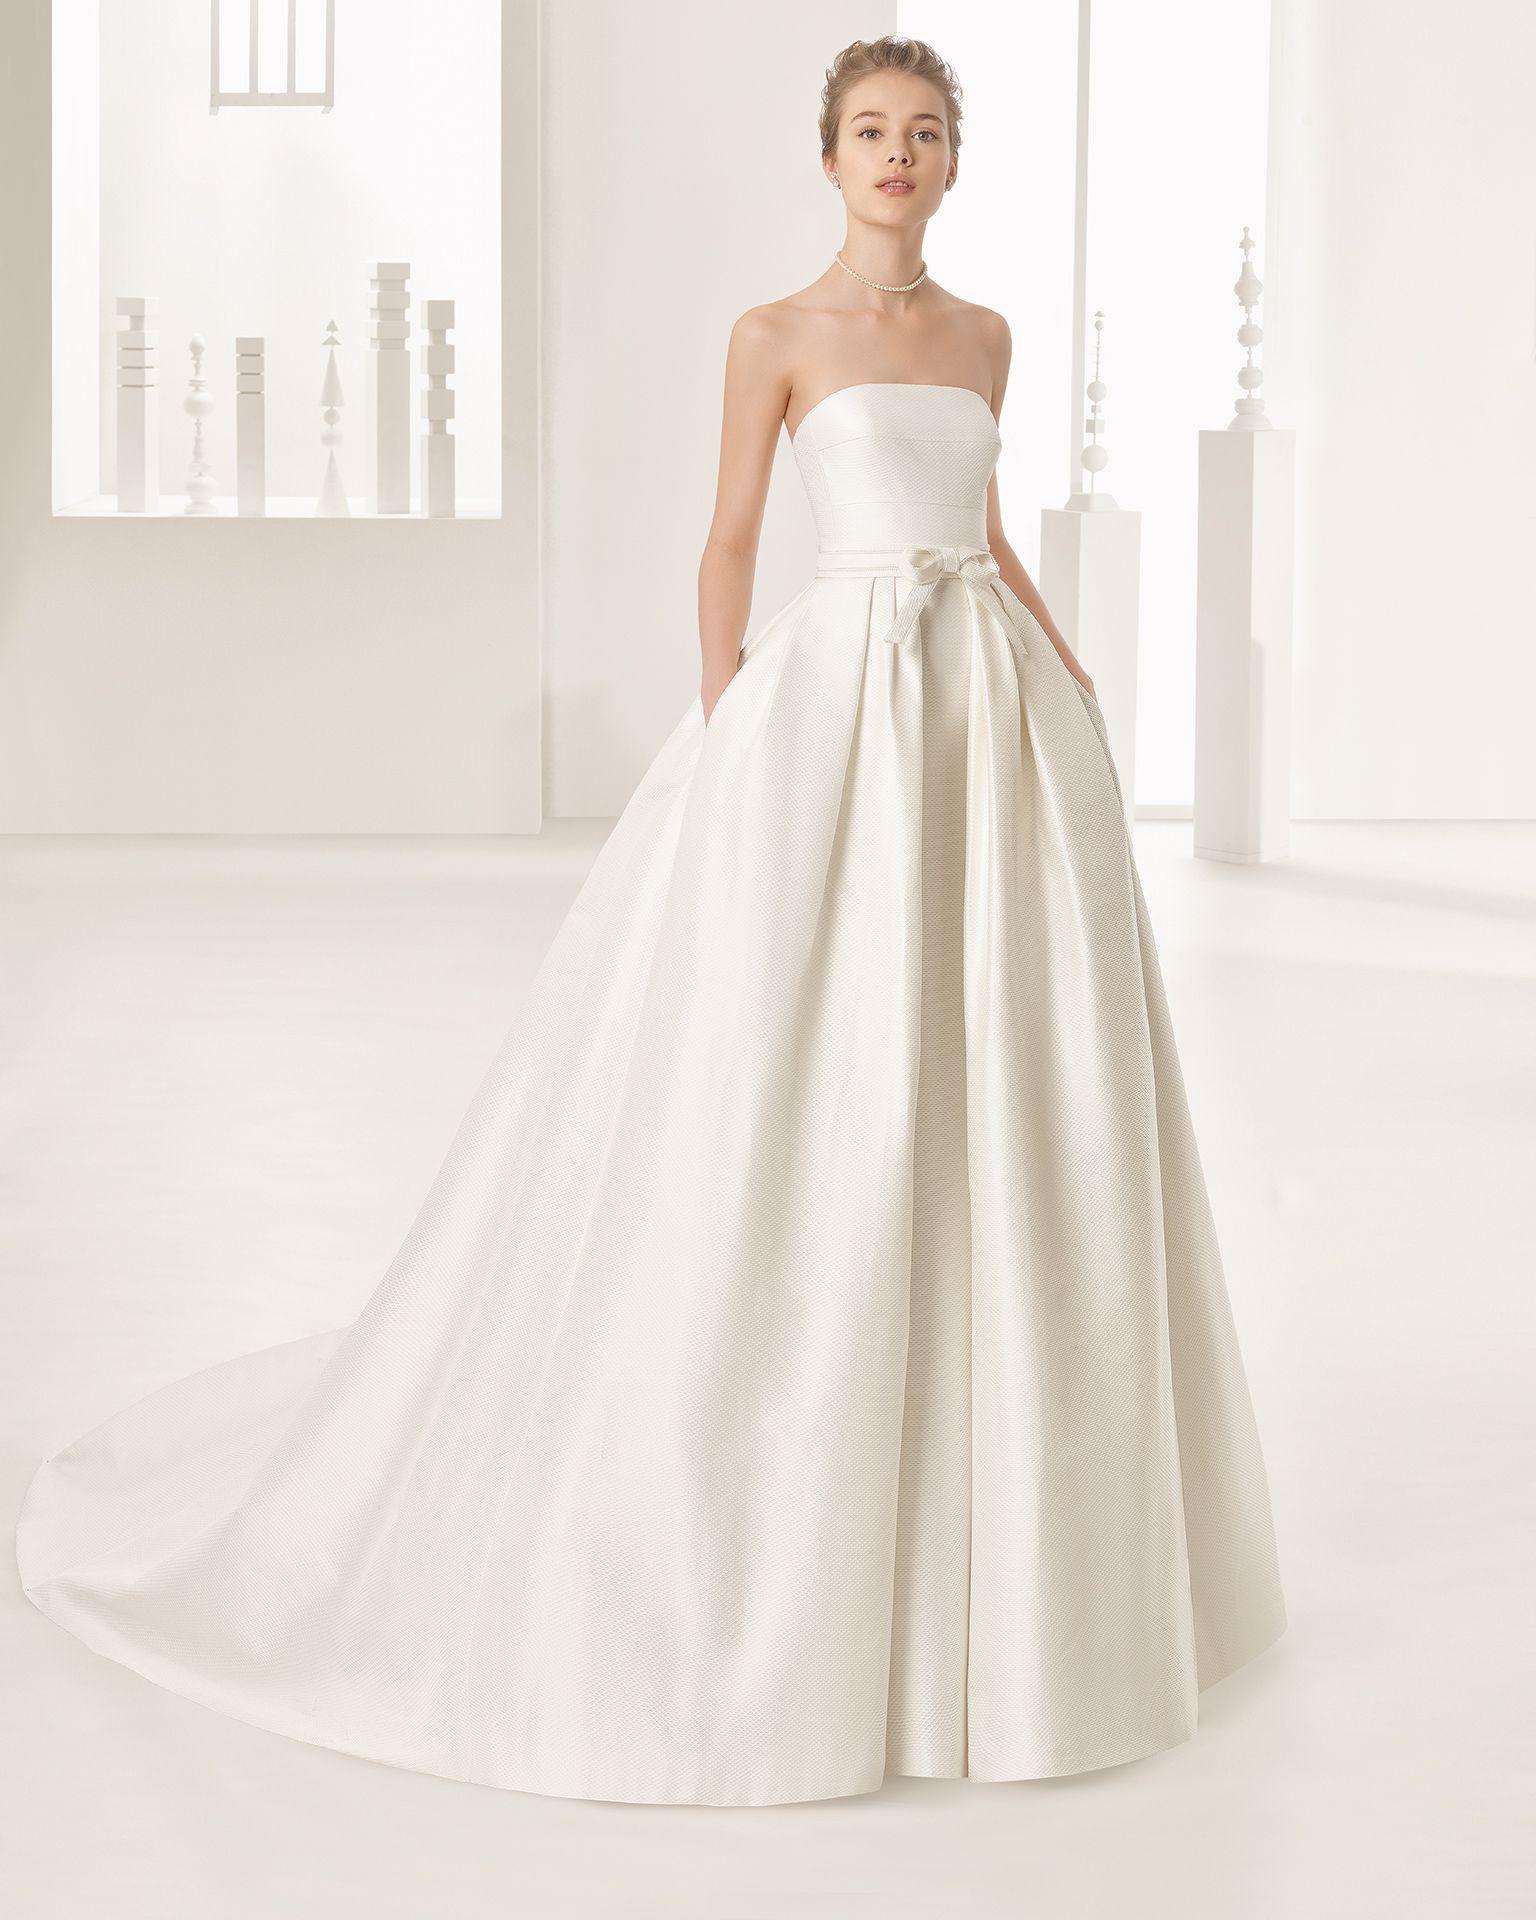 Naroa - Hochzeit 2017. Rosa Clará Kollektion | Hochzeitskleider ...